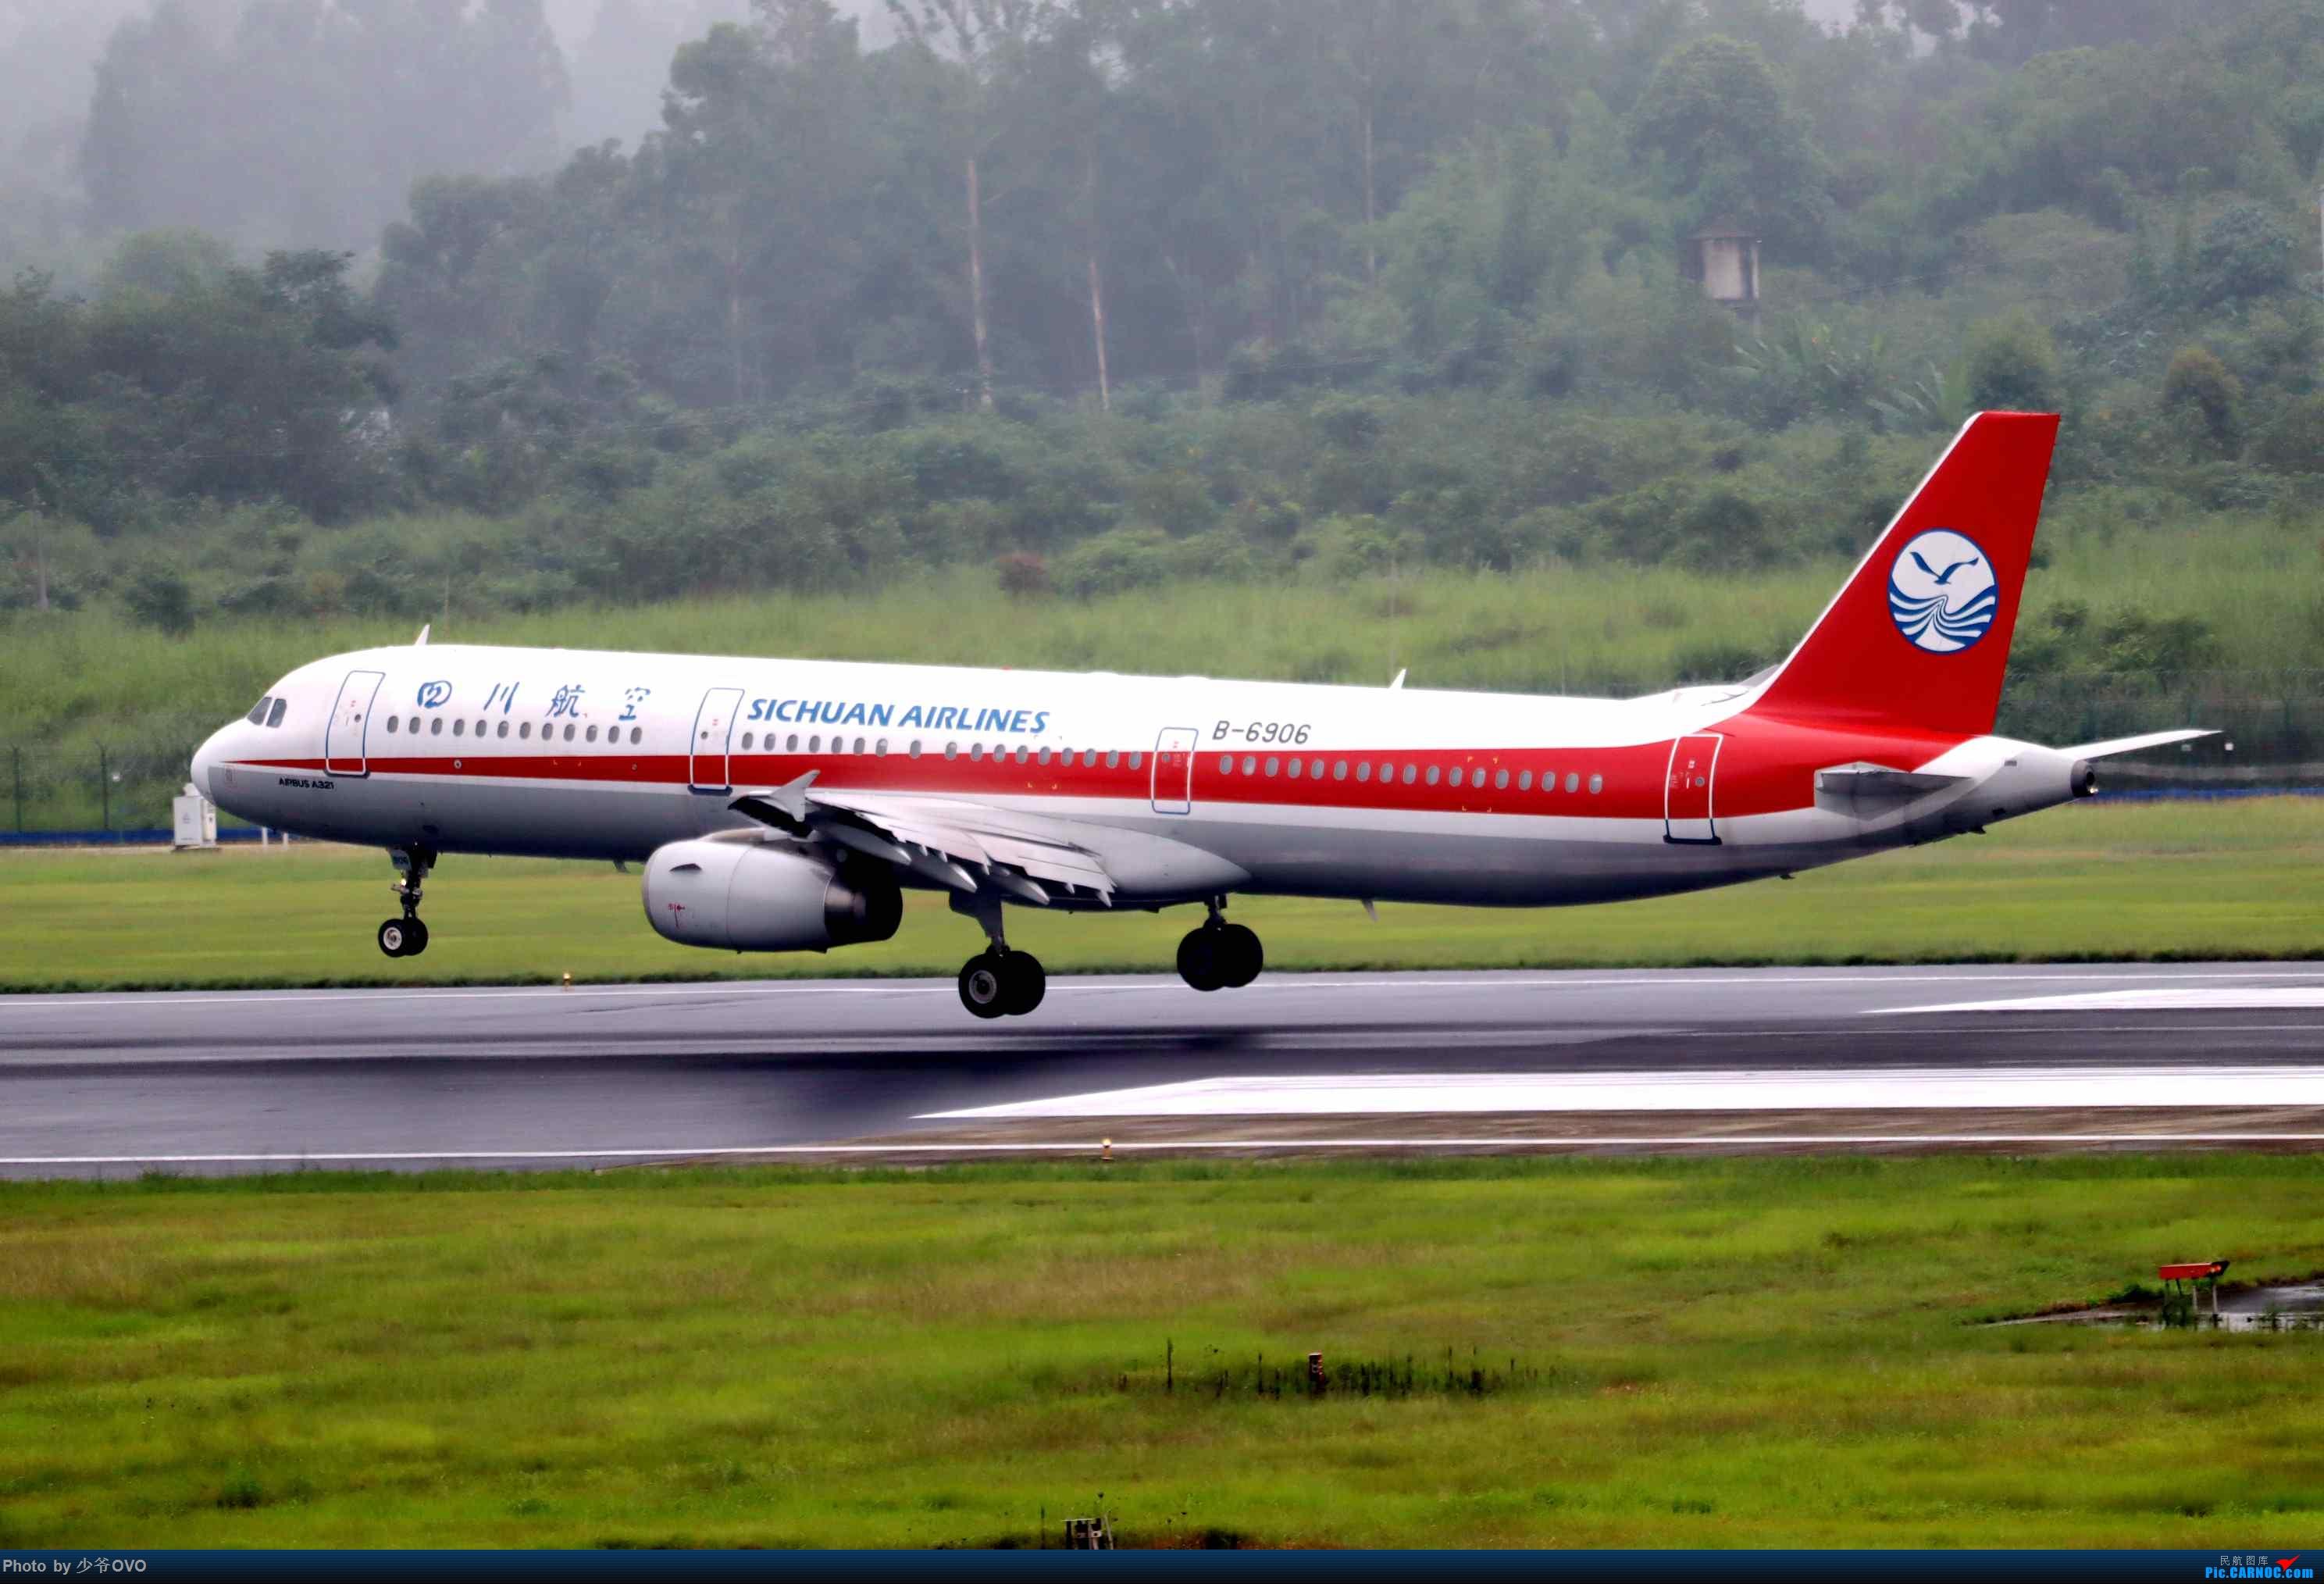 Re:[原创](2020.8.1)少爷的CTU拍机(厦门航空联合国787) AIRBUS A321-200 B-6906 中国成都双流国际机场